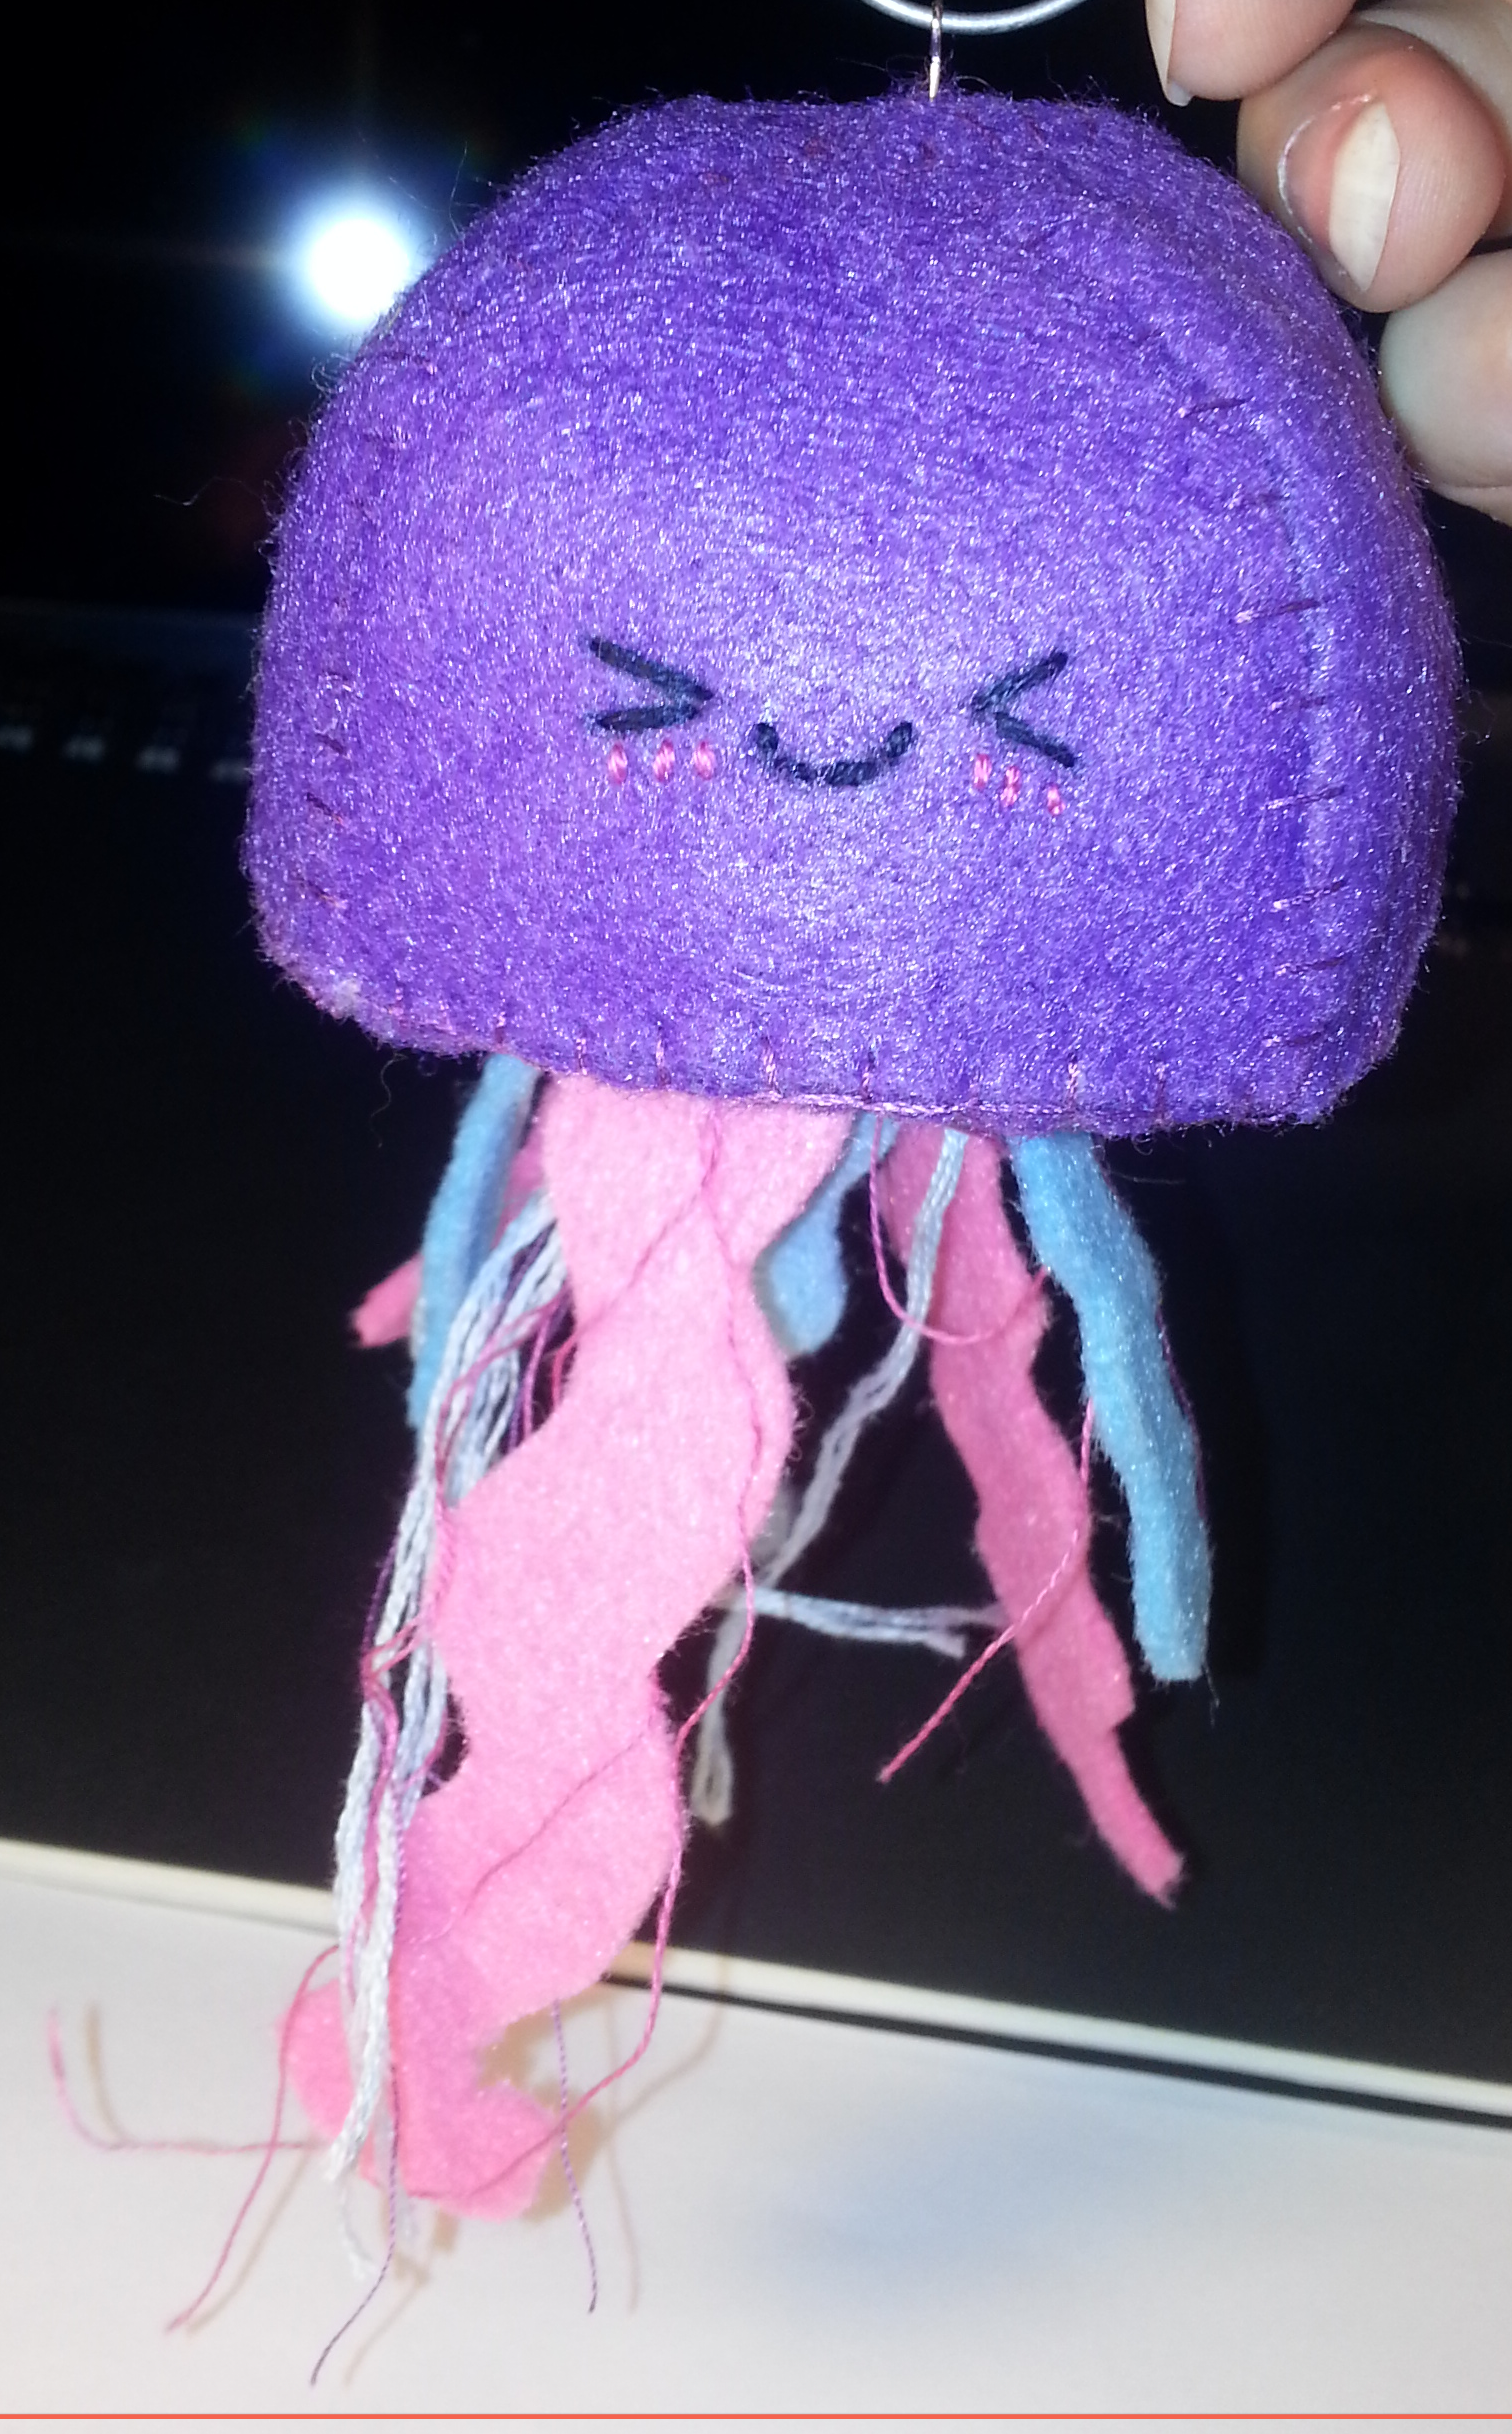 Squishy Jellyfish Toys : Jellyfish Plush (Squishy) by LadyZombieRobot